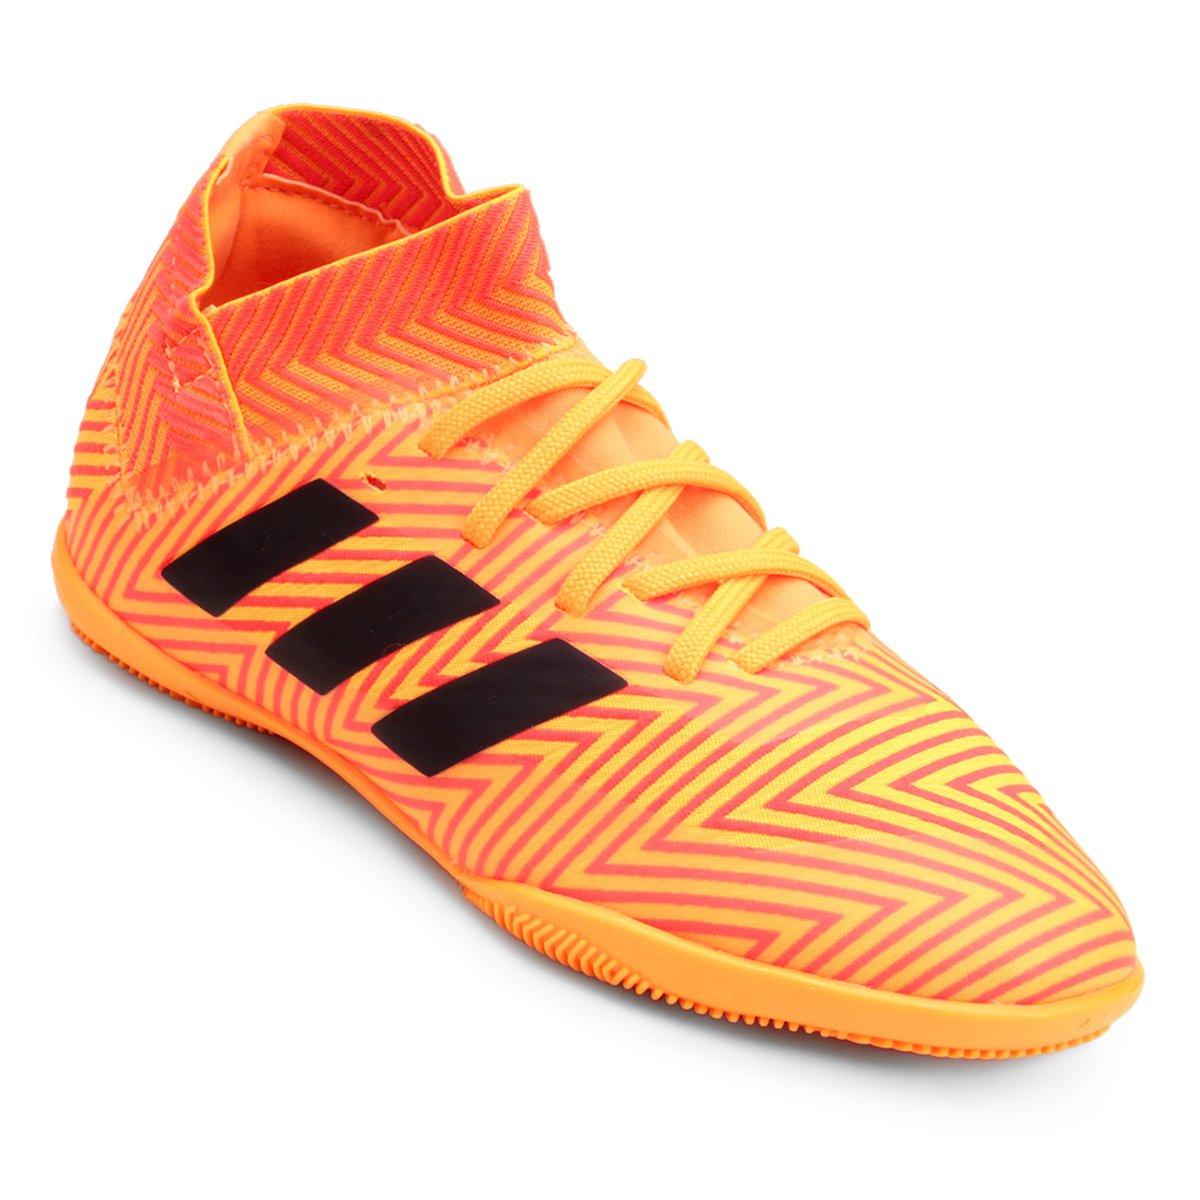 e215d838d7 Chuteira Futsal Infantil Adidas Nemeziz Tango 18 3 IN